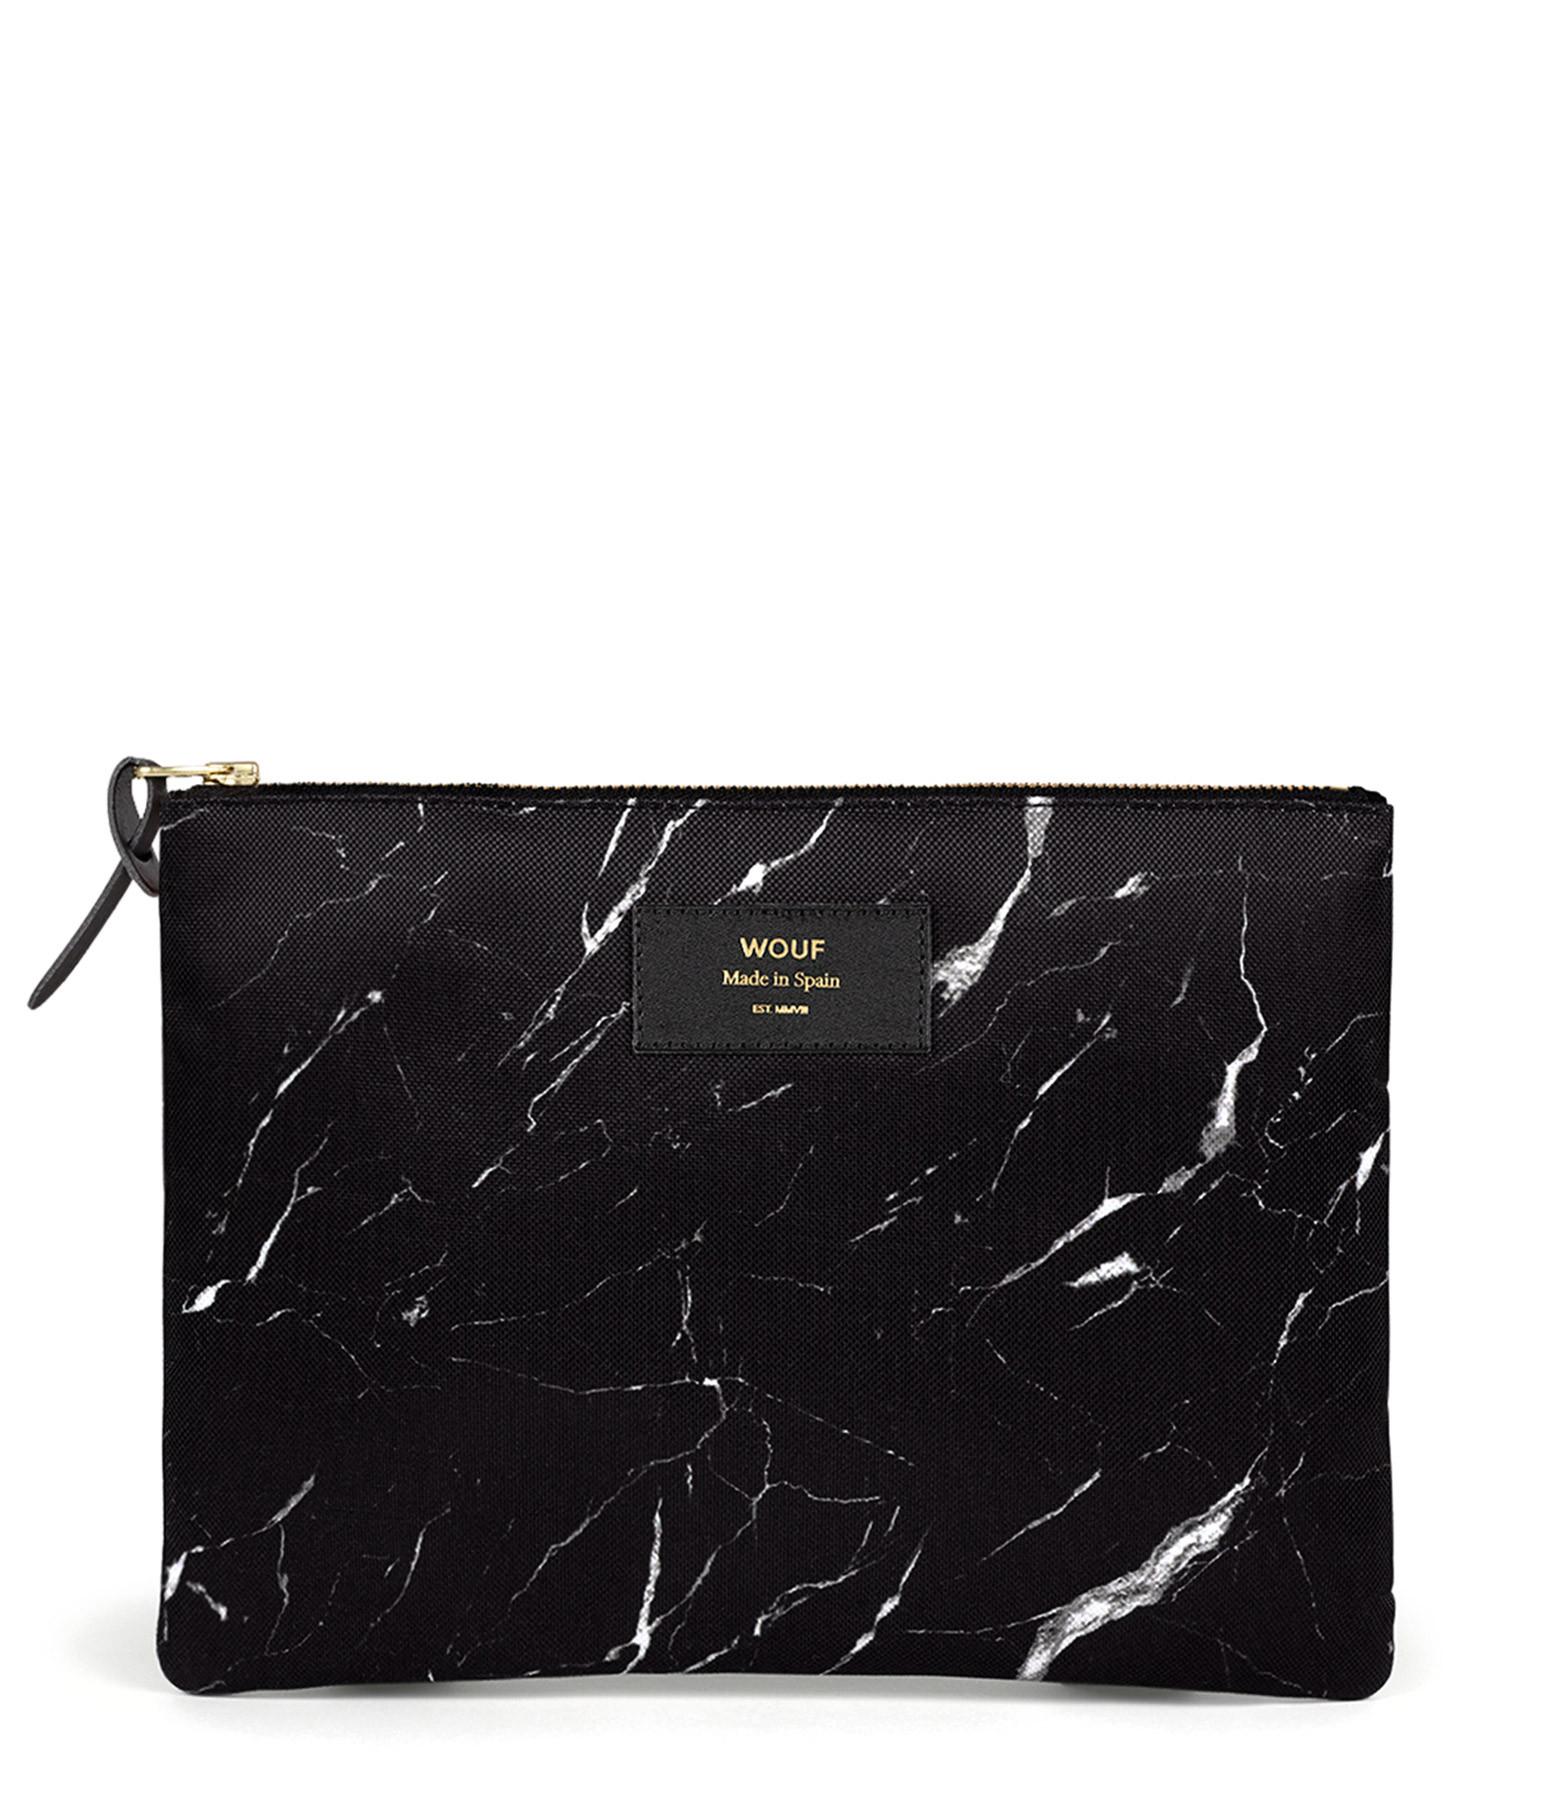 WOUF - Trousse XL Black Marble